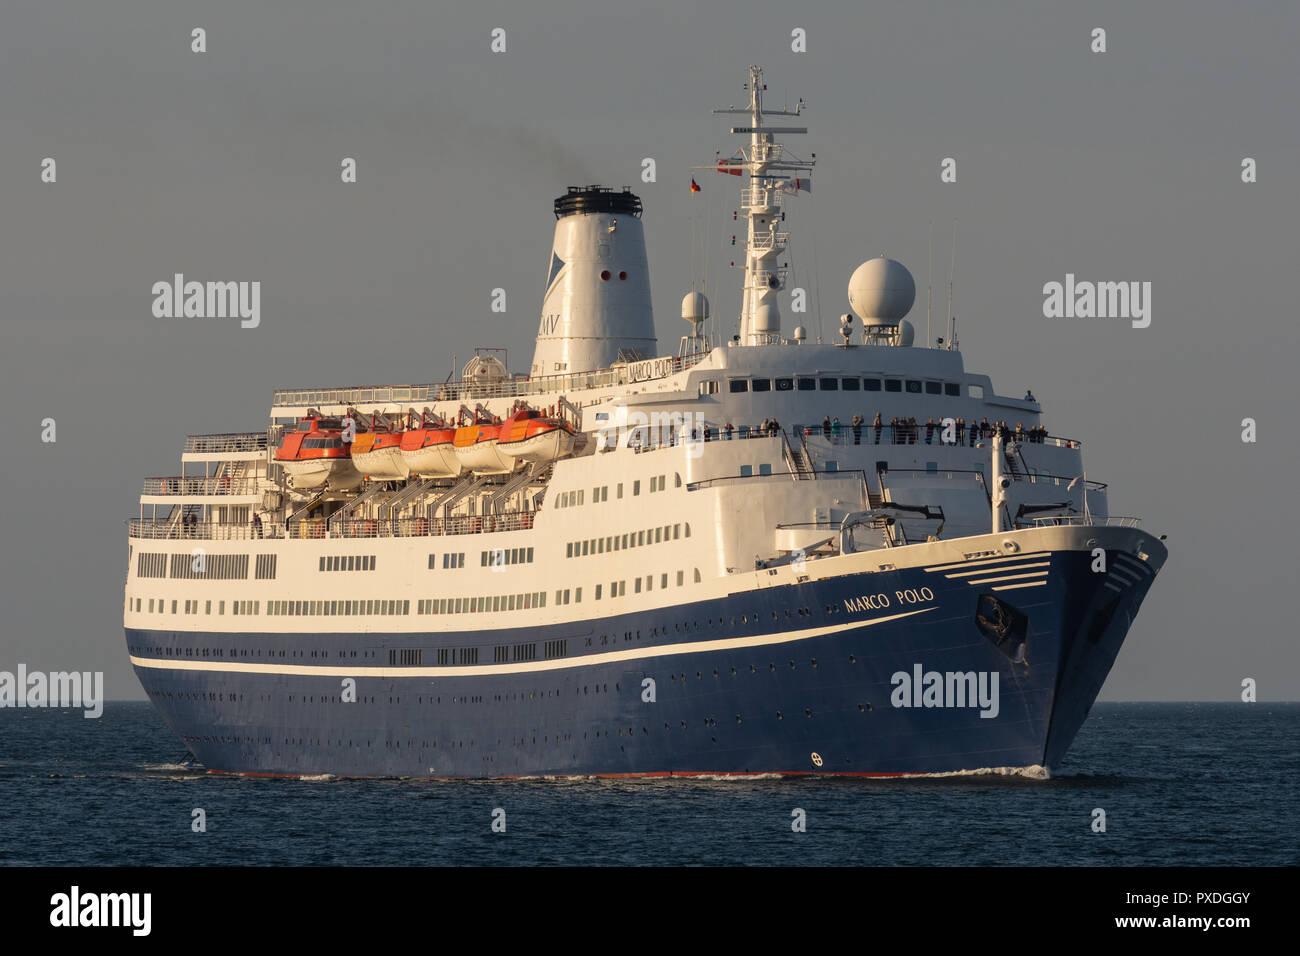 Cruiseship Marco Polo inbound Kiel fjord, bound for Holtenau locks, later Kiel canal Stock Photo